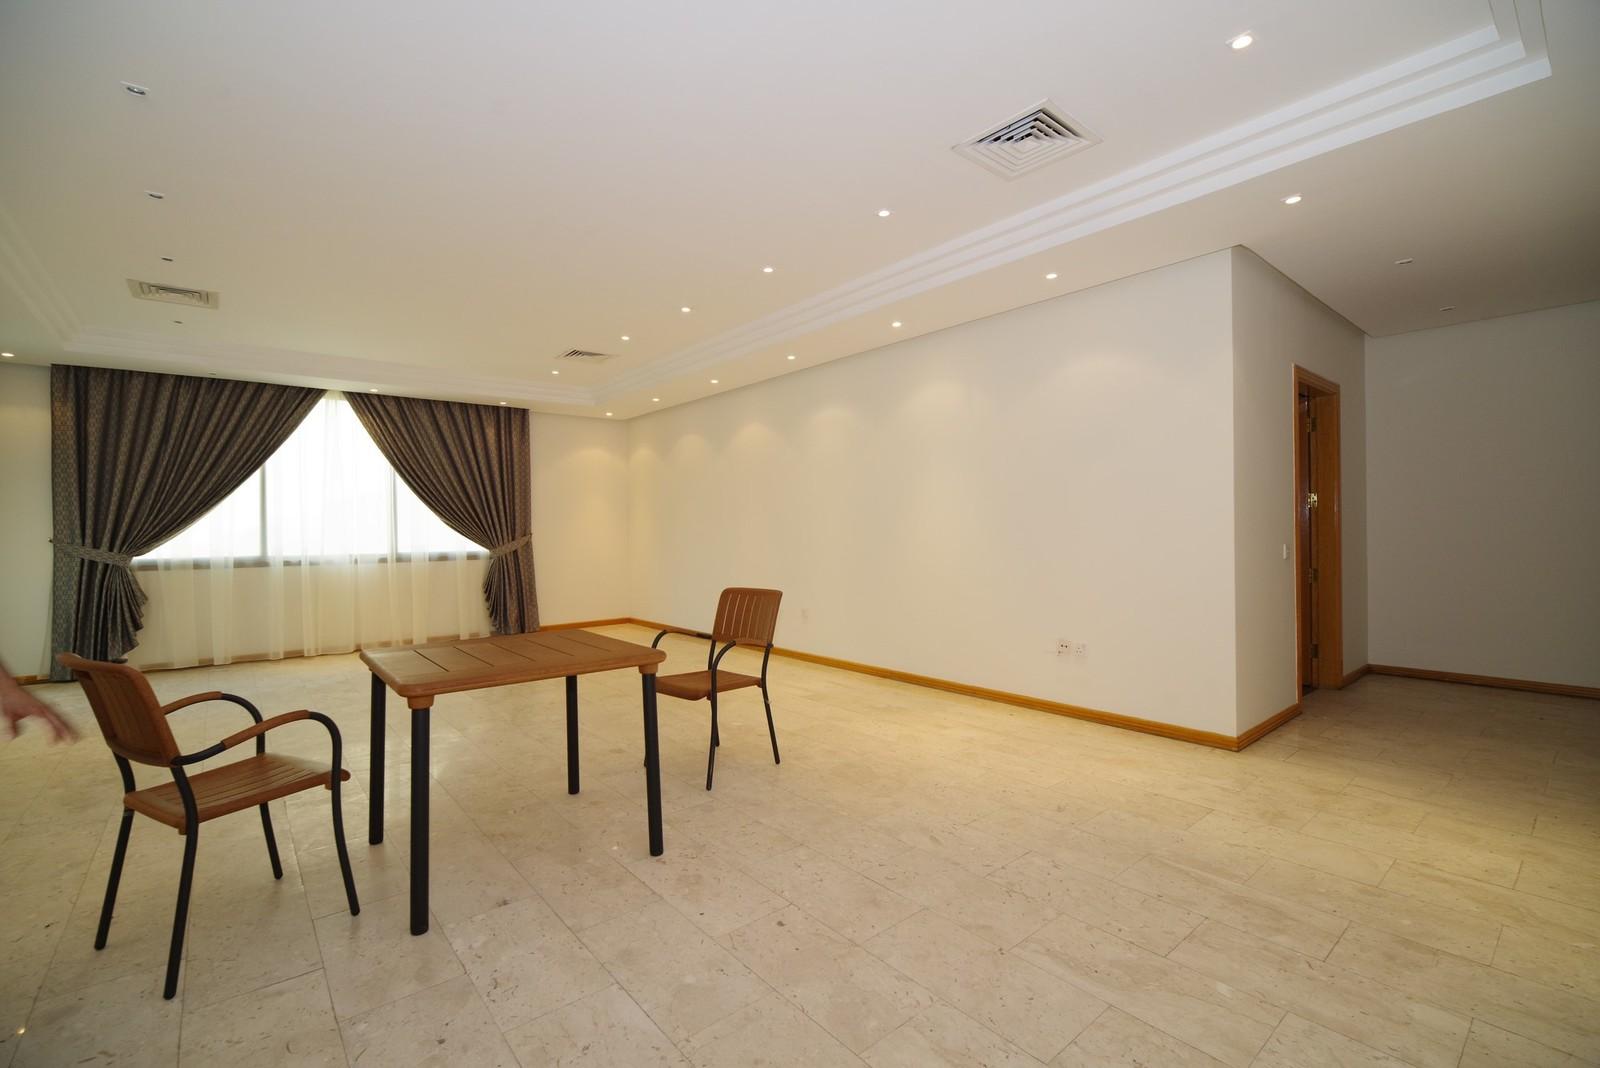 Salwa – older, large, unfurnished three bedroom apartments